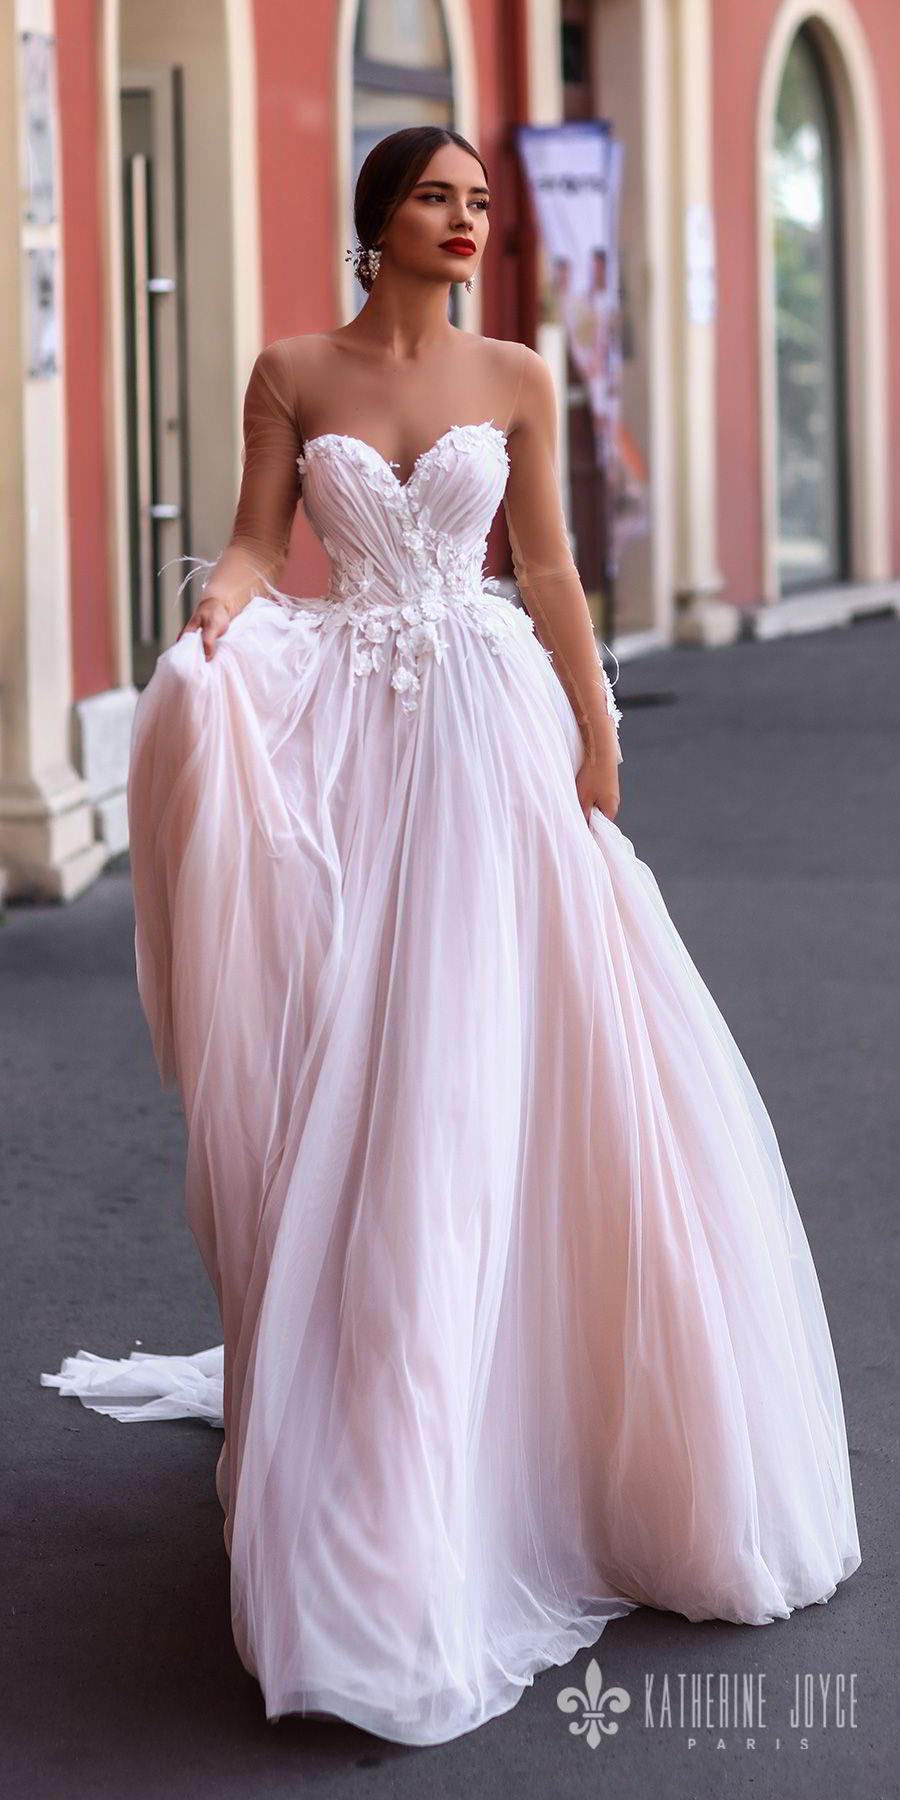 b3b742bccad7 katherine joyce 2018 sheer long sleeves illusion bateau strapless sweetheart  neckline heavily embellished bodice romantic pink